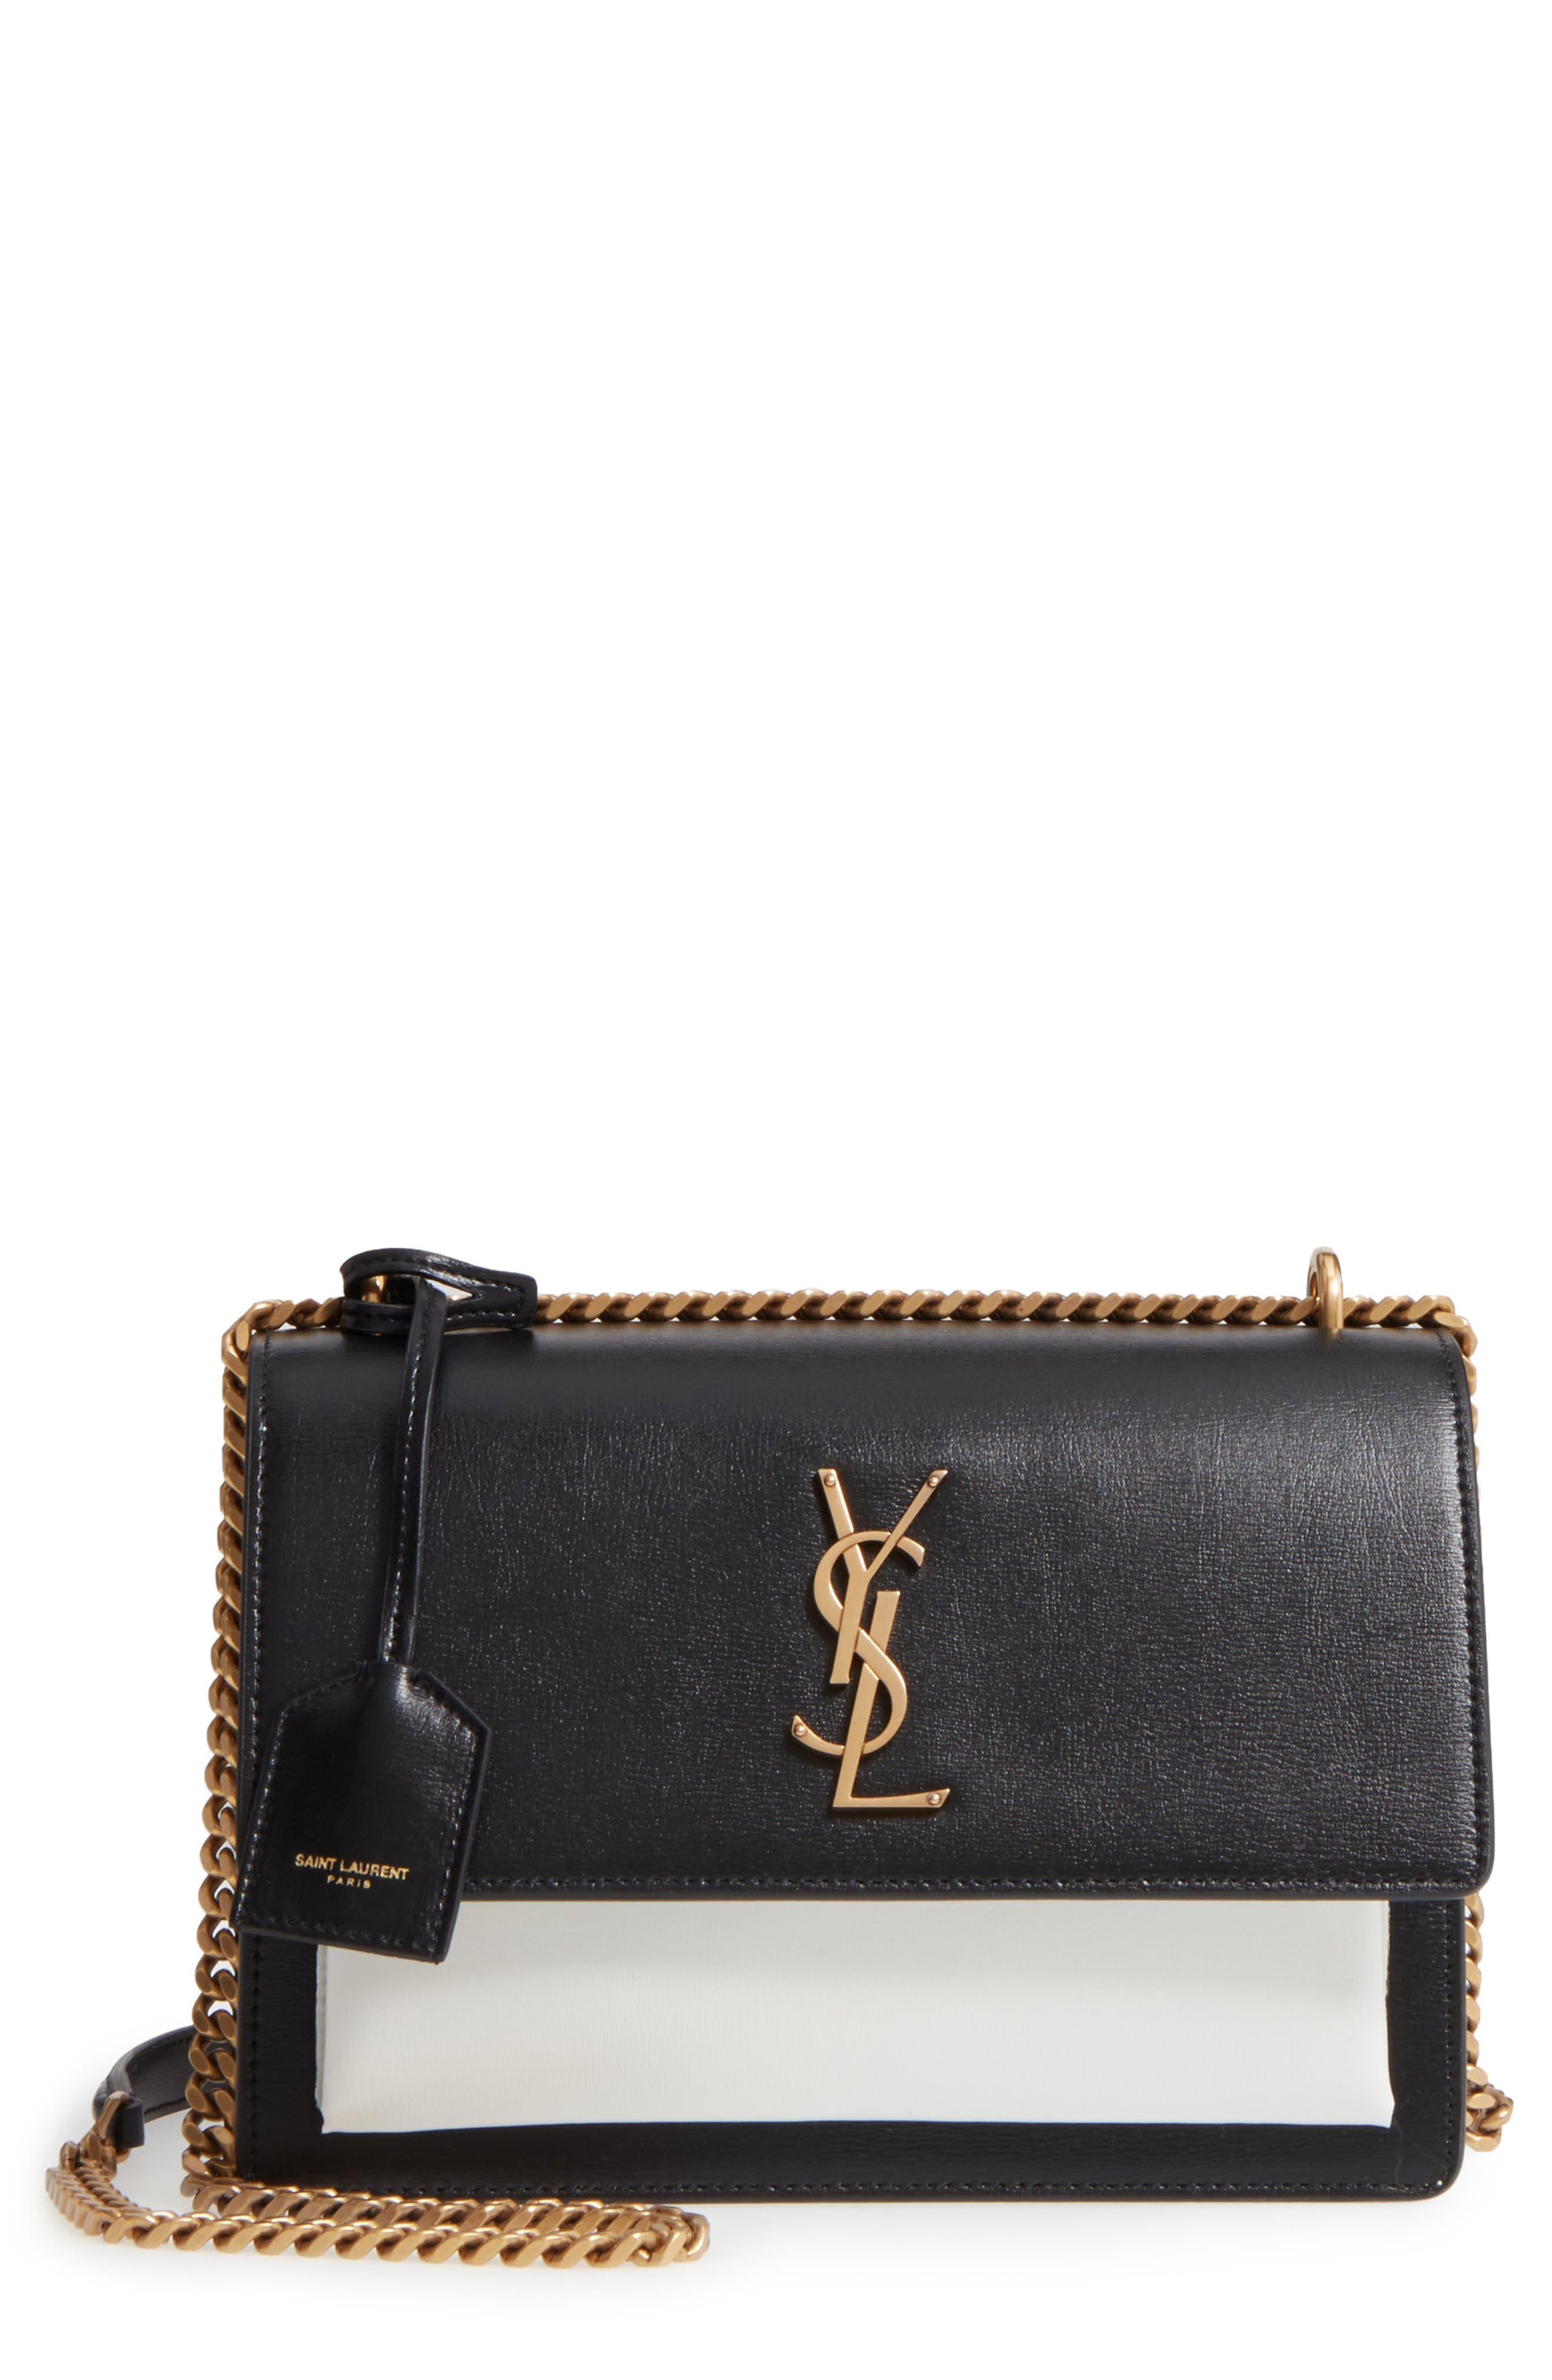 Medium Sunset Leather Shoulder Bag,                             Main thumbnail 1, color,                             Black/ White